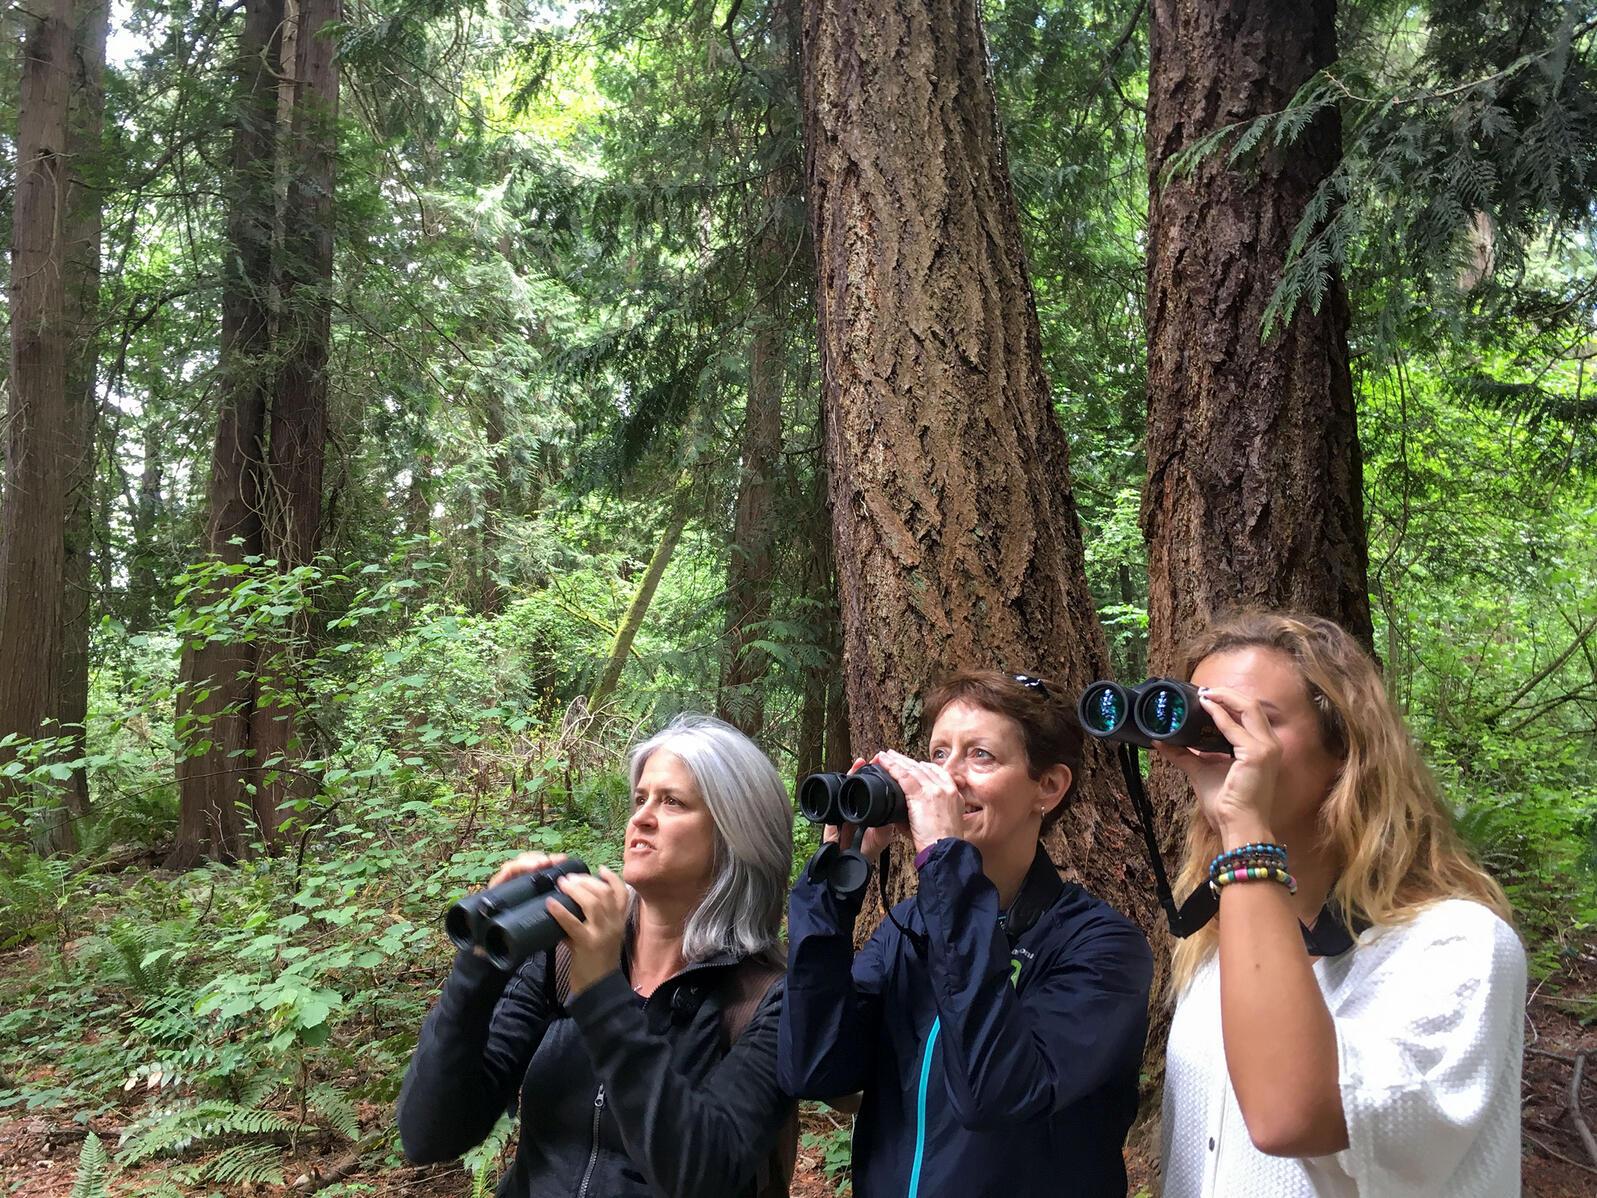 North Carolina Audubon field organizer Kim Brand, climate ambassador Mary Abrams, and volunteer Sarah Ramsey birding in Seward Park. Kelly Knutson/Audubon